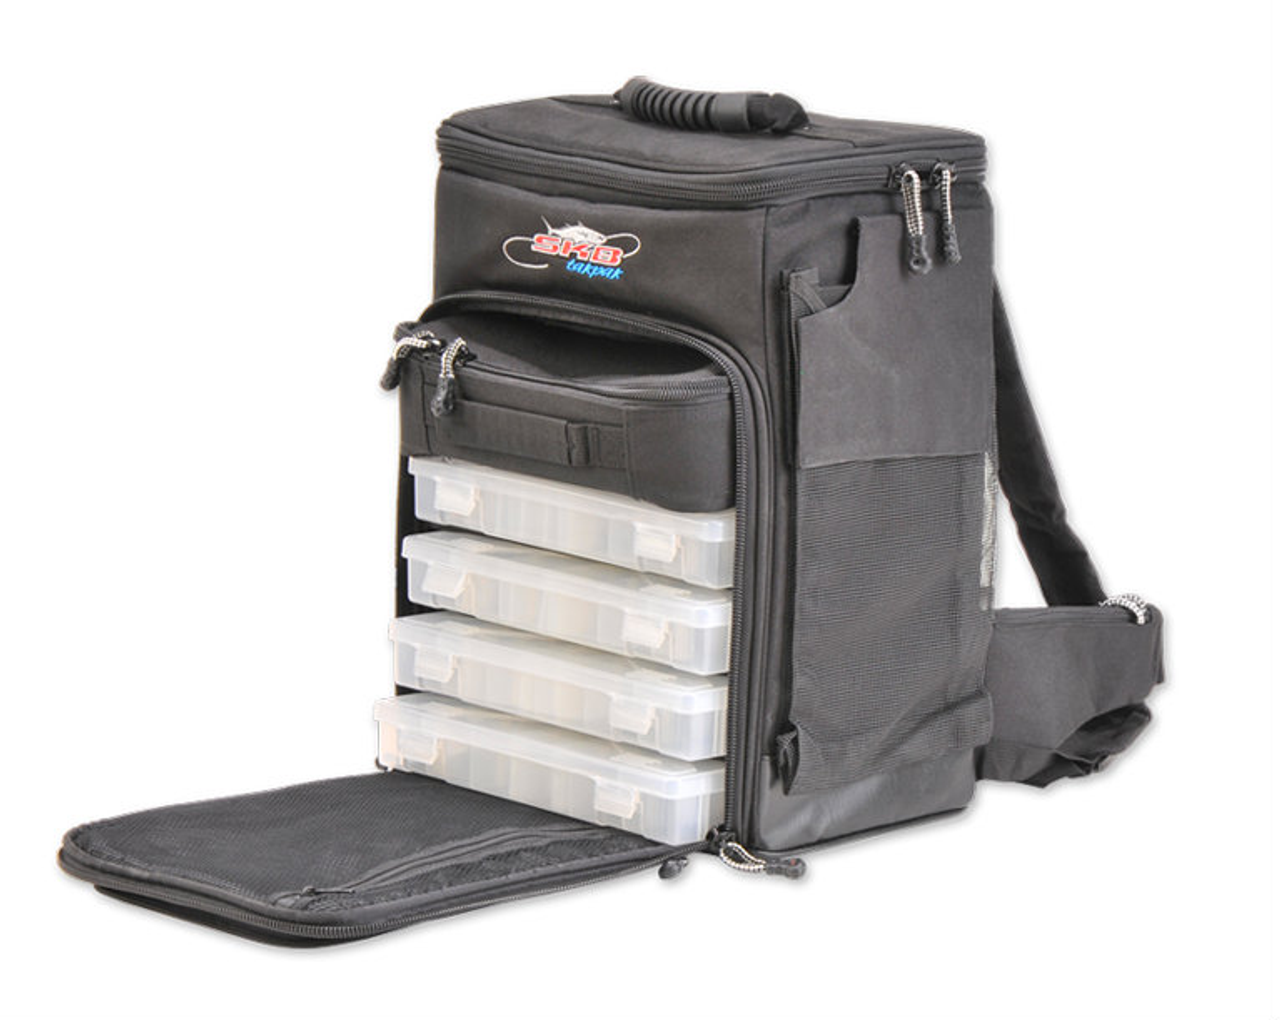 Backpack Fishing Tackle Box | Tak-Pak Organizer